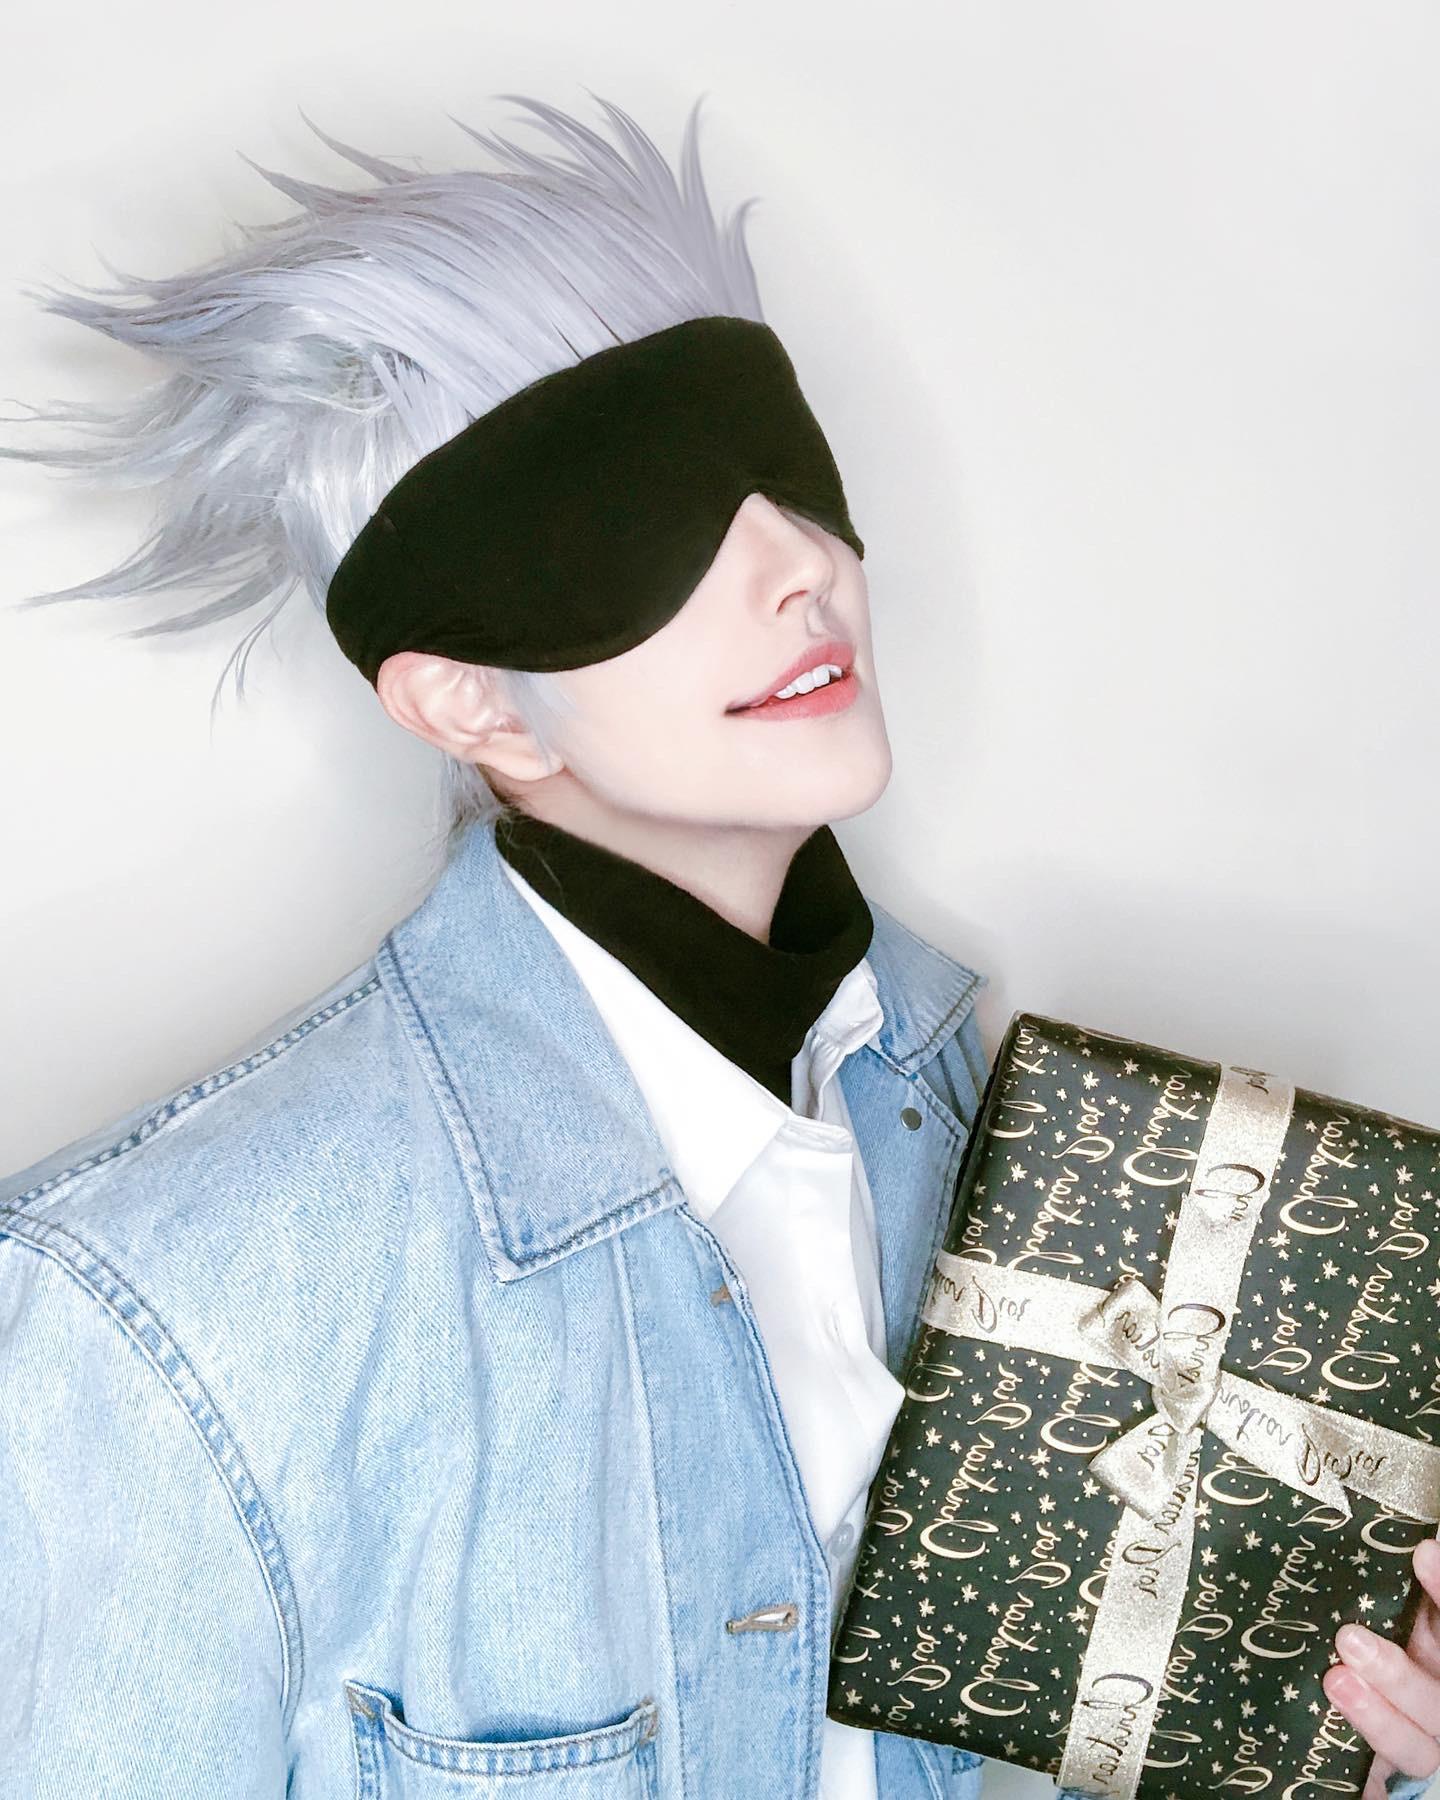 《咒术回战》狼祁cosplay-第1张